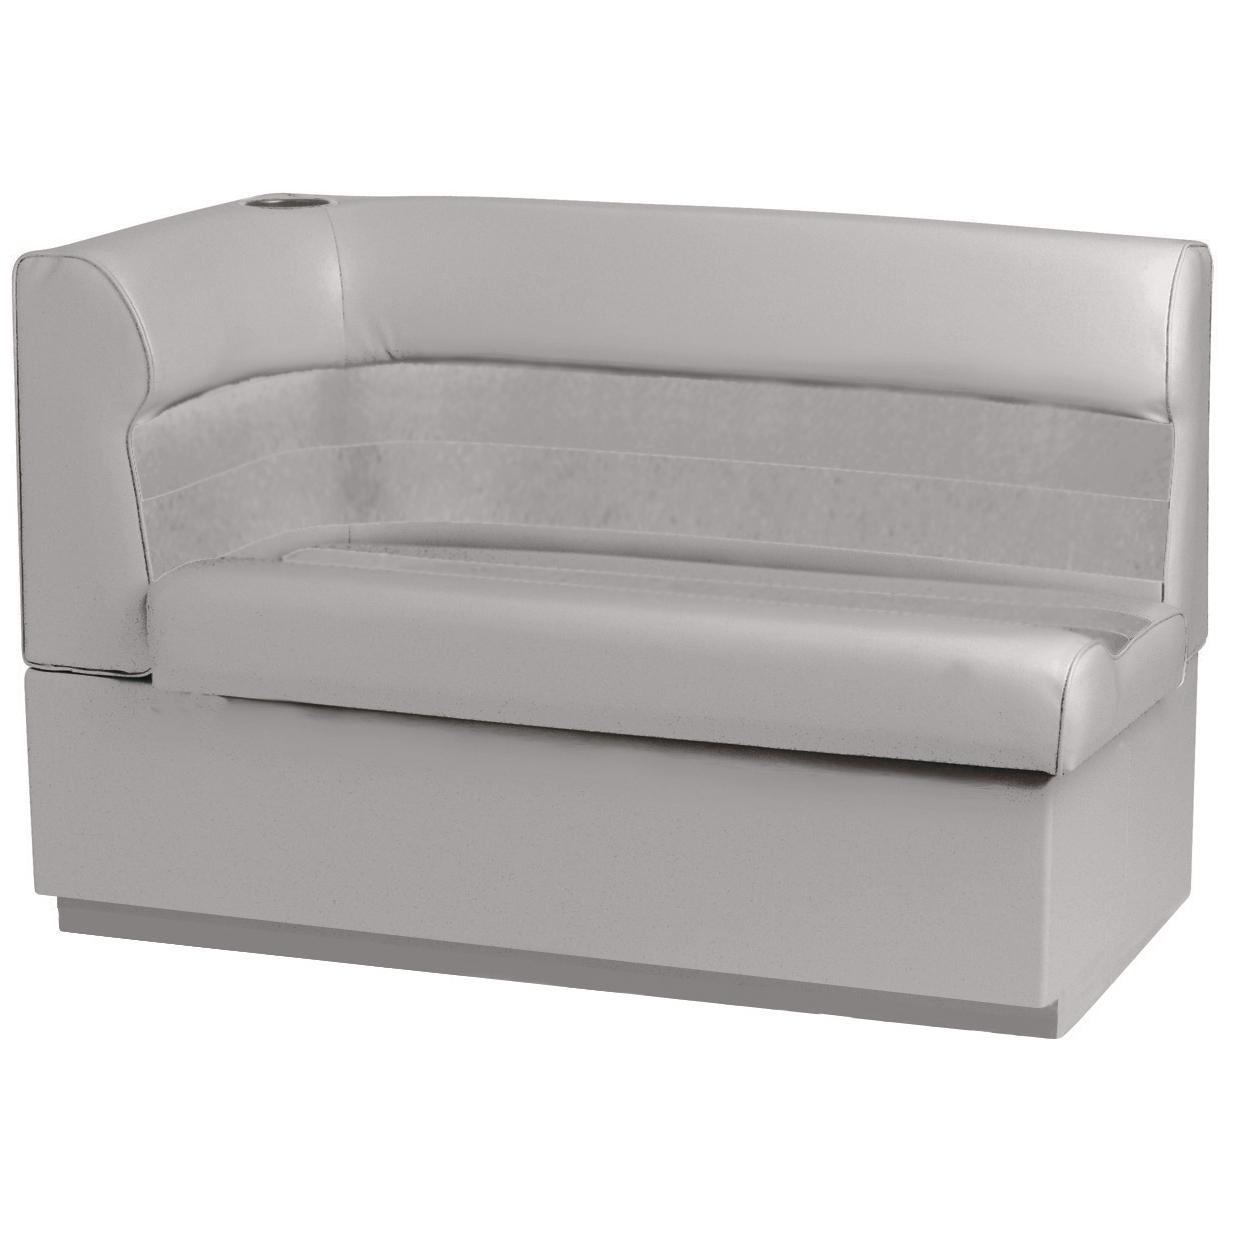 Surprising Bm Deluxe Pontoon Corner Couch Right Creativecarmelina Interior Chair Design Creativecarmelinacom